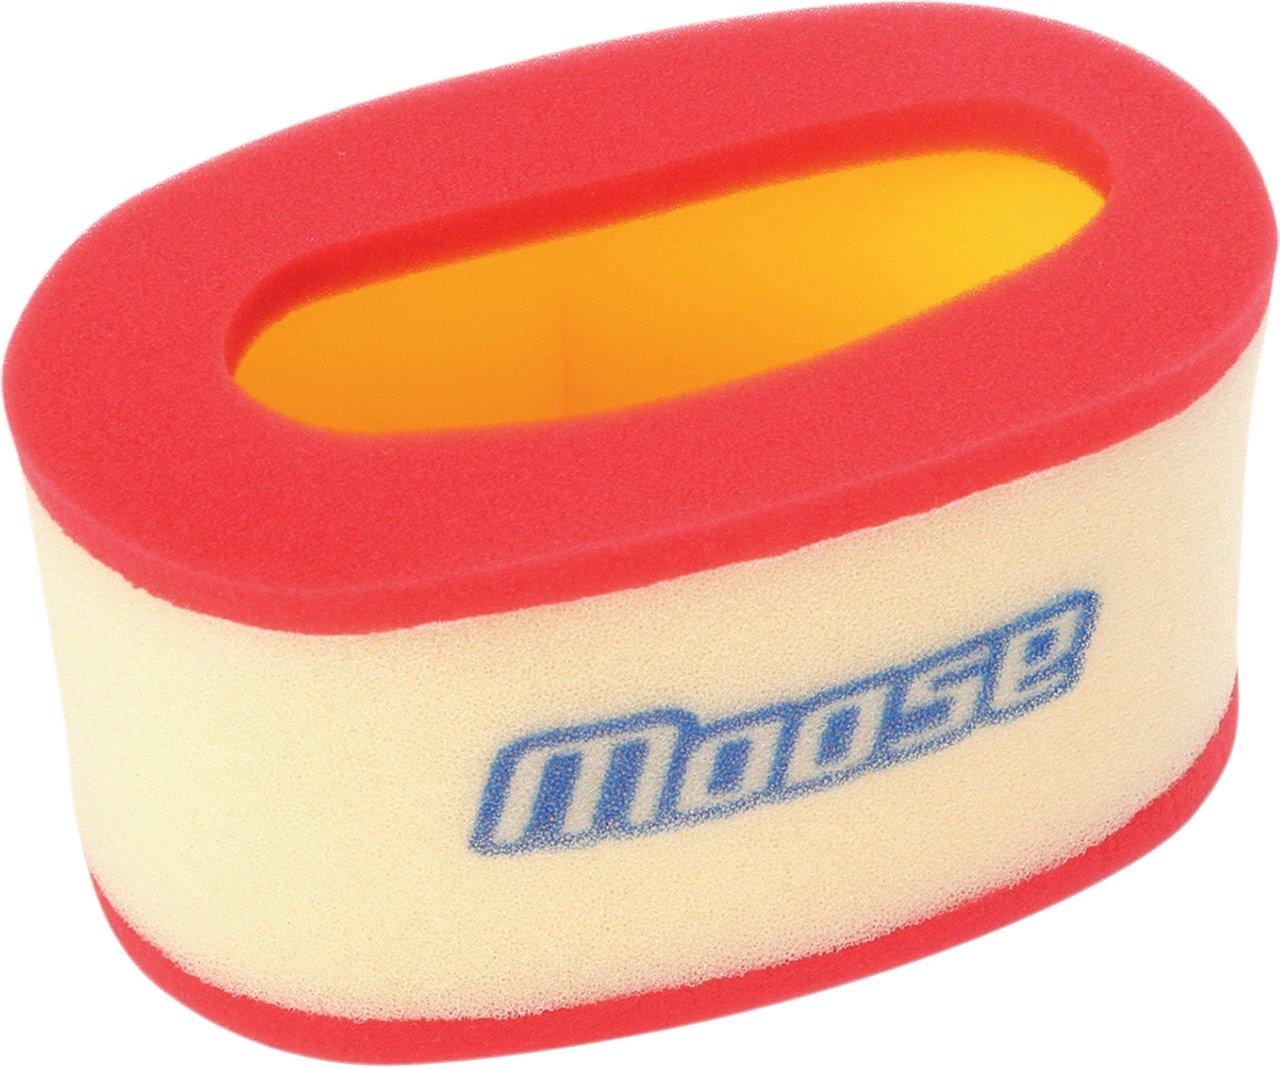 【MOOSE RACING】PPO (PRECISION PRE-OILED) 空氣濾芯 [M763-20-22] - 「Webike-摩托百貨」